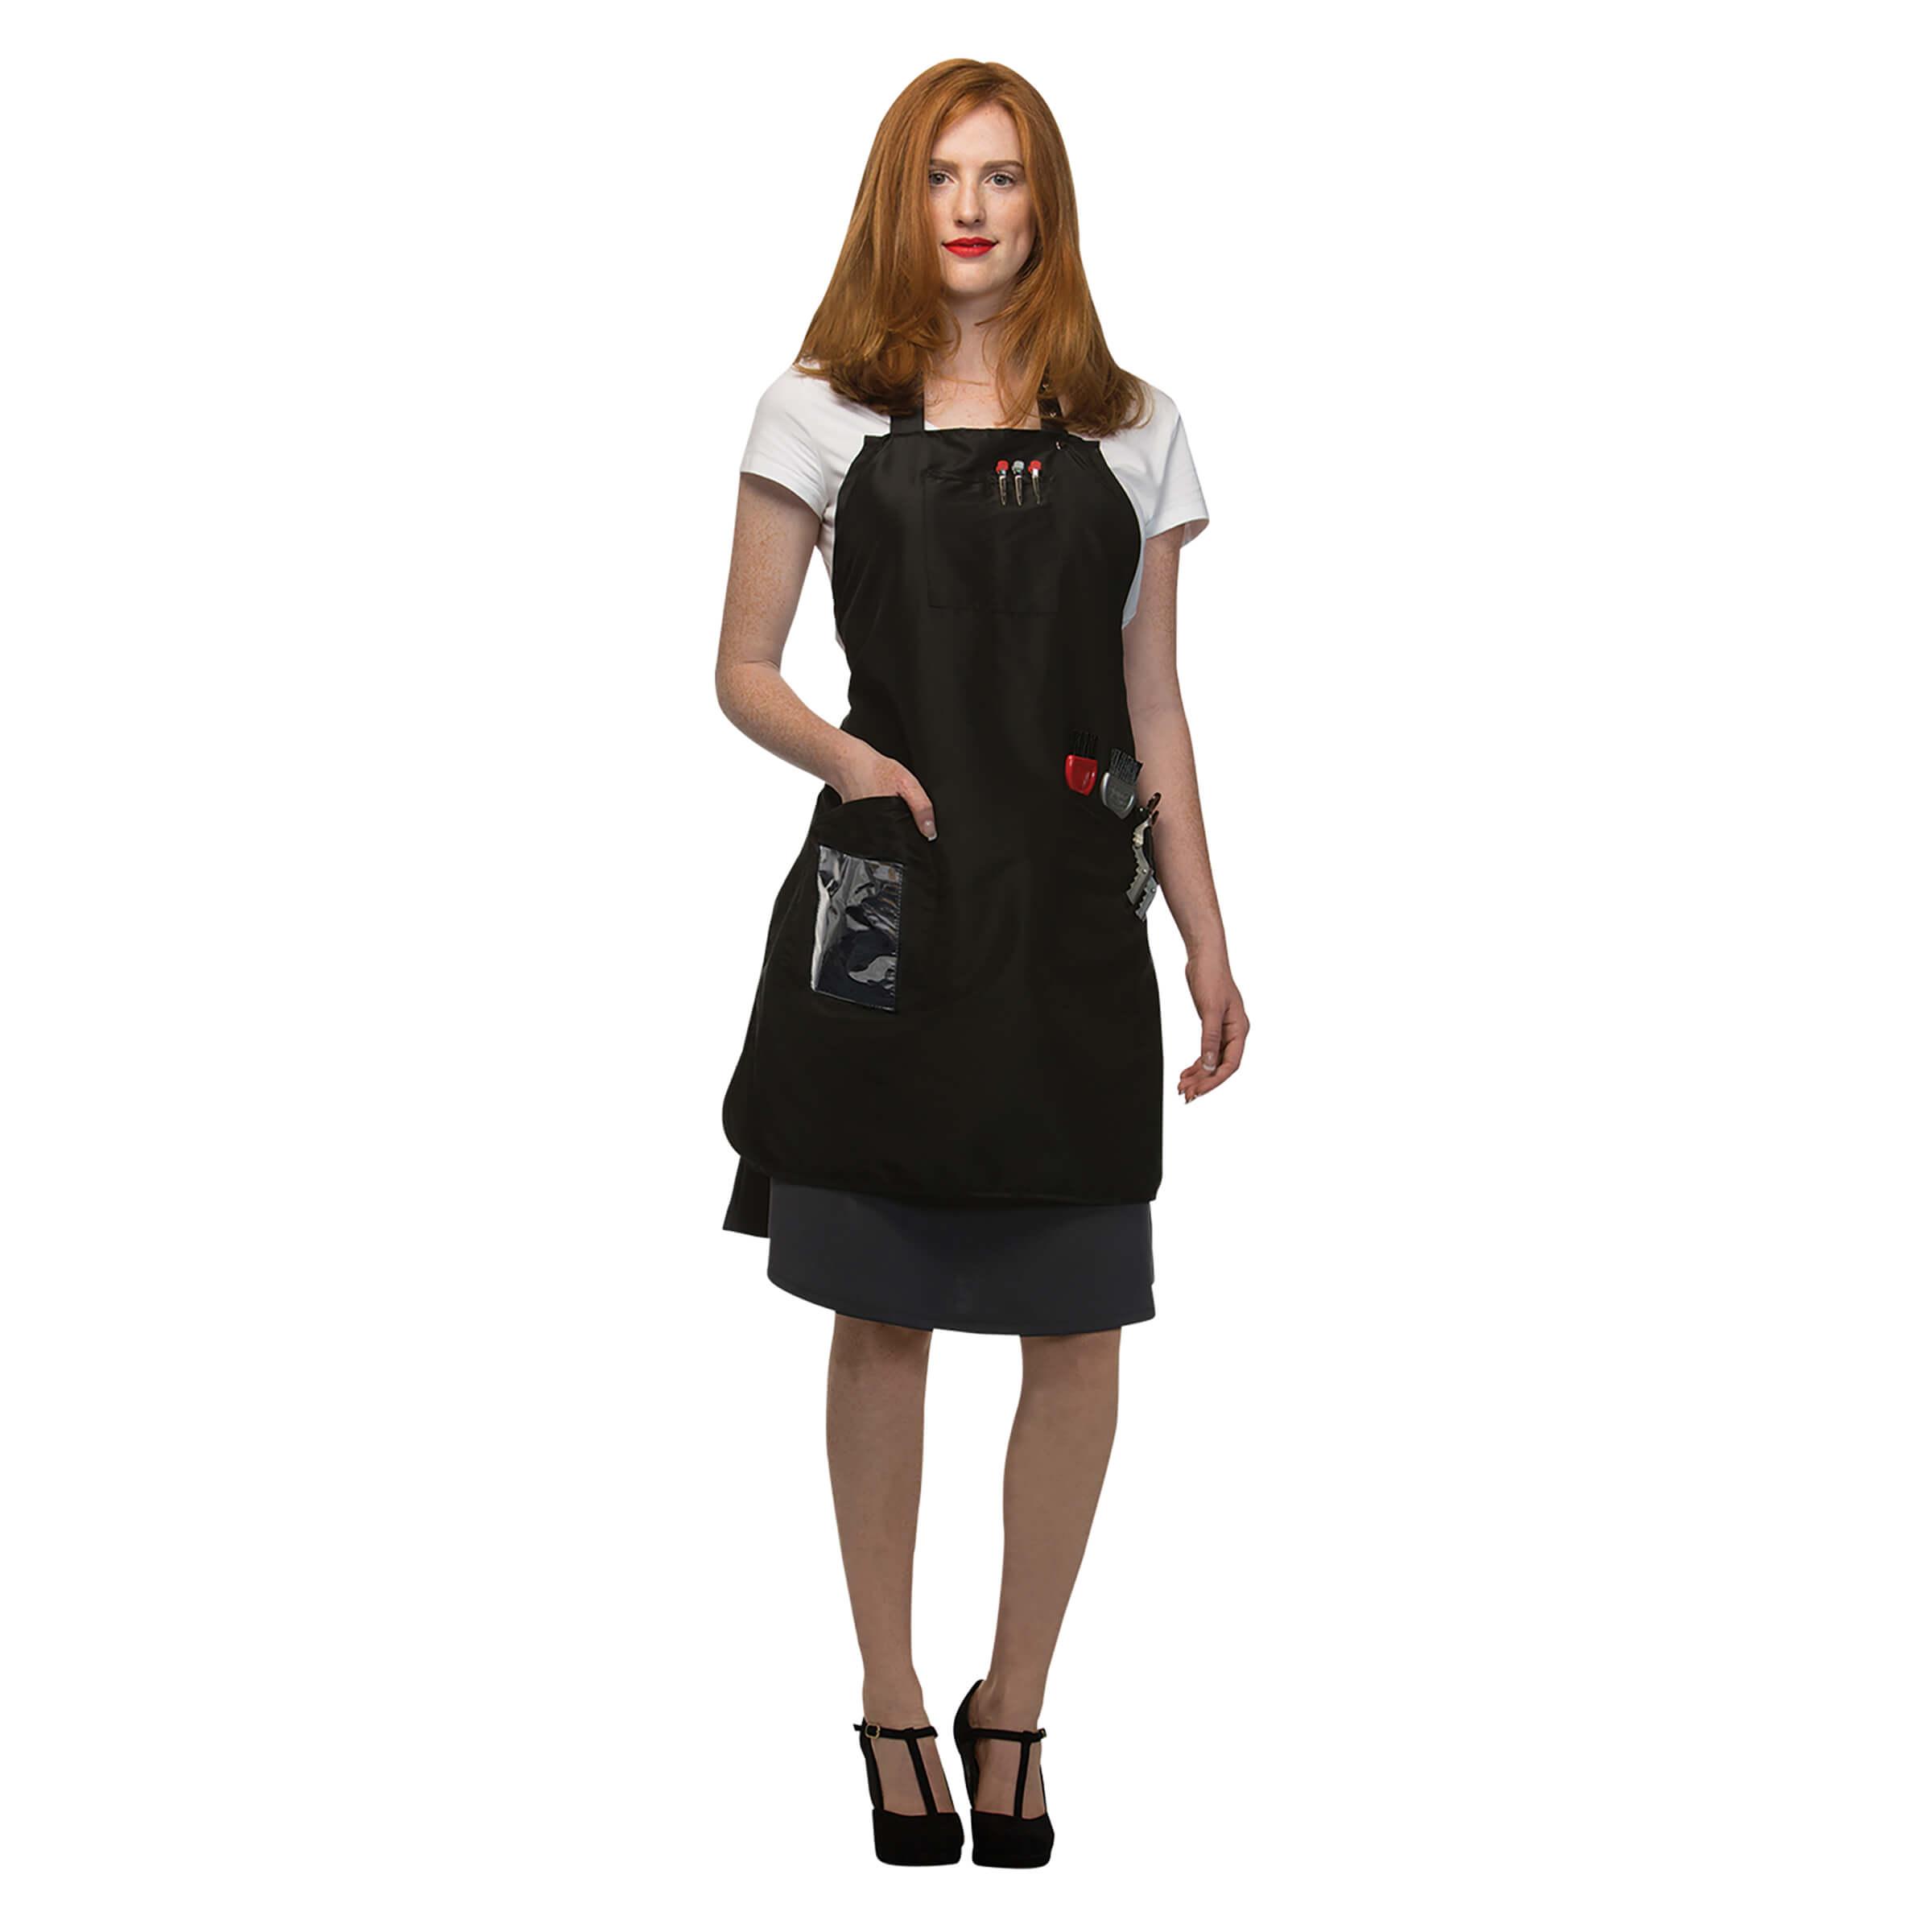 SA-BLK-a-stylist-apron-black-l.jpg